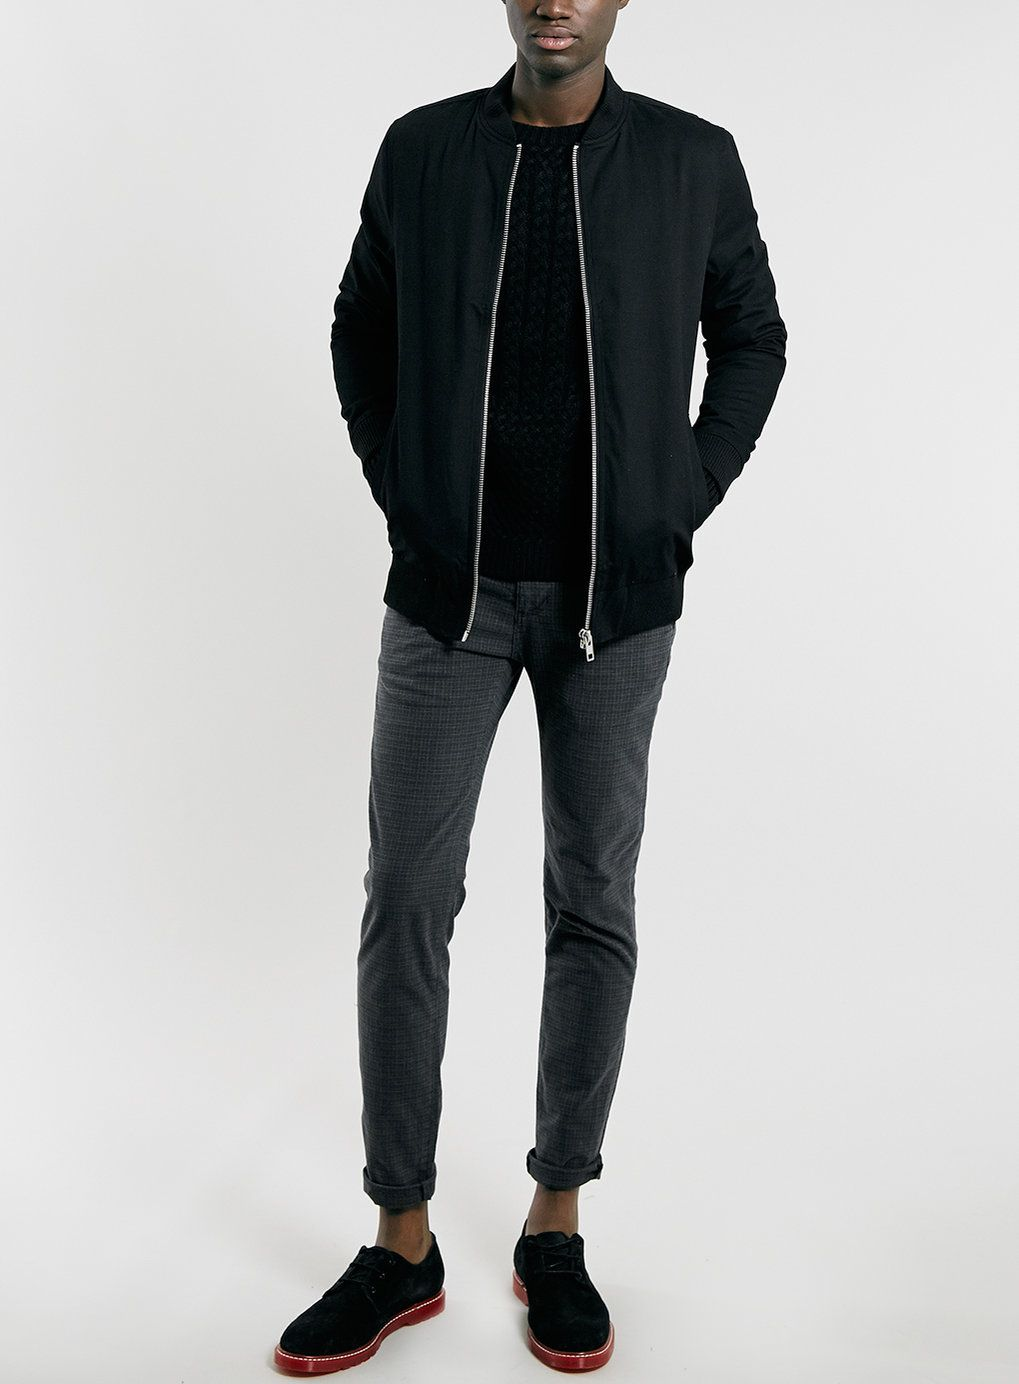 BLACK LONGLINE BOMBER JACKET - Mens Coats & Jackets - Clothing ...